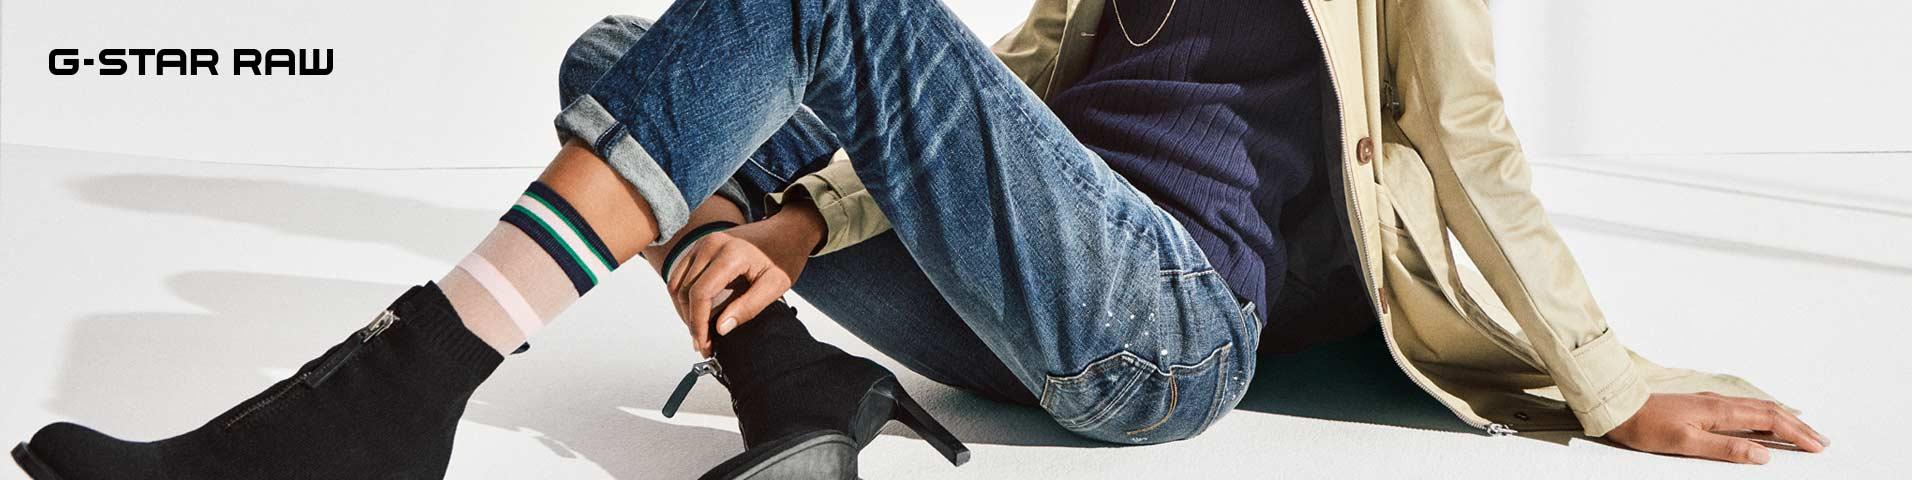 af6e1c69cdb G-Star Dames jeans | Spijkerbroeken online kopen | ZALANDO